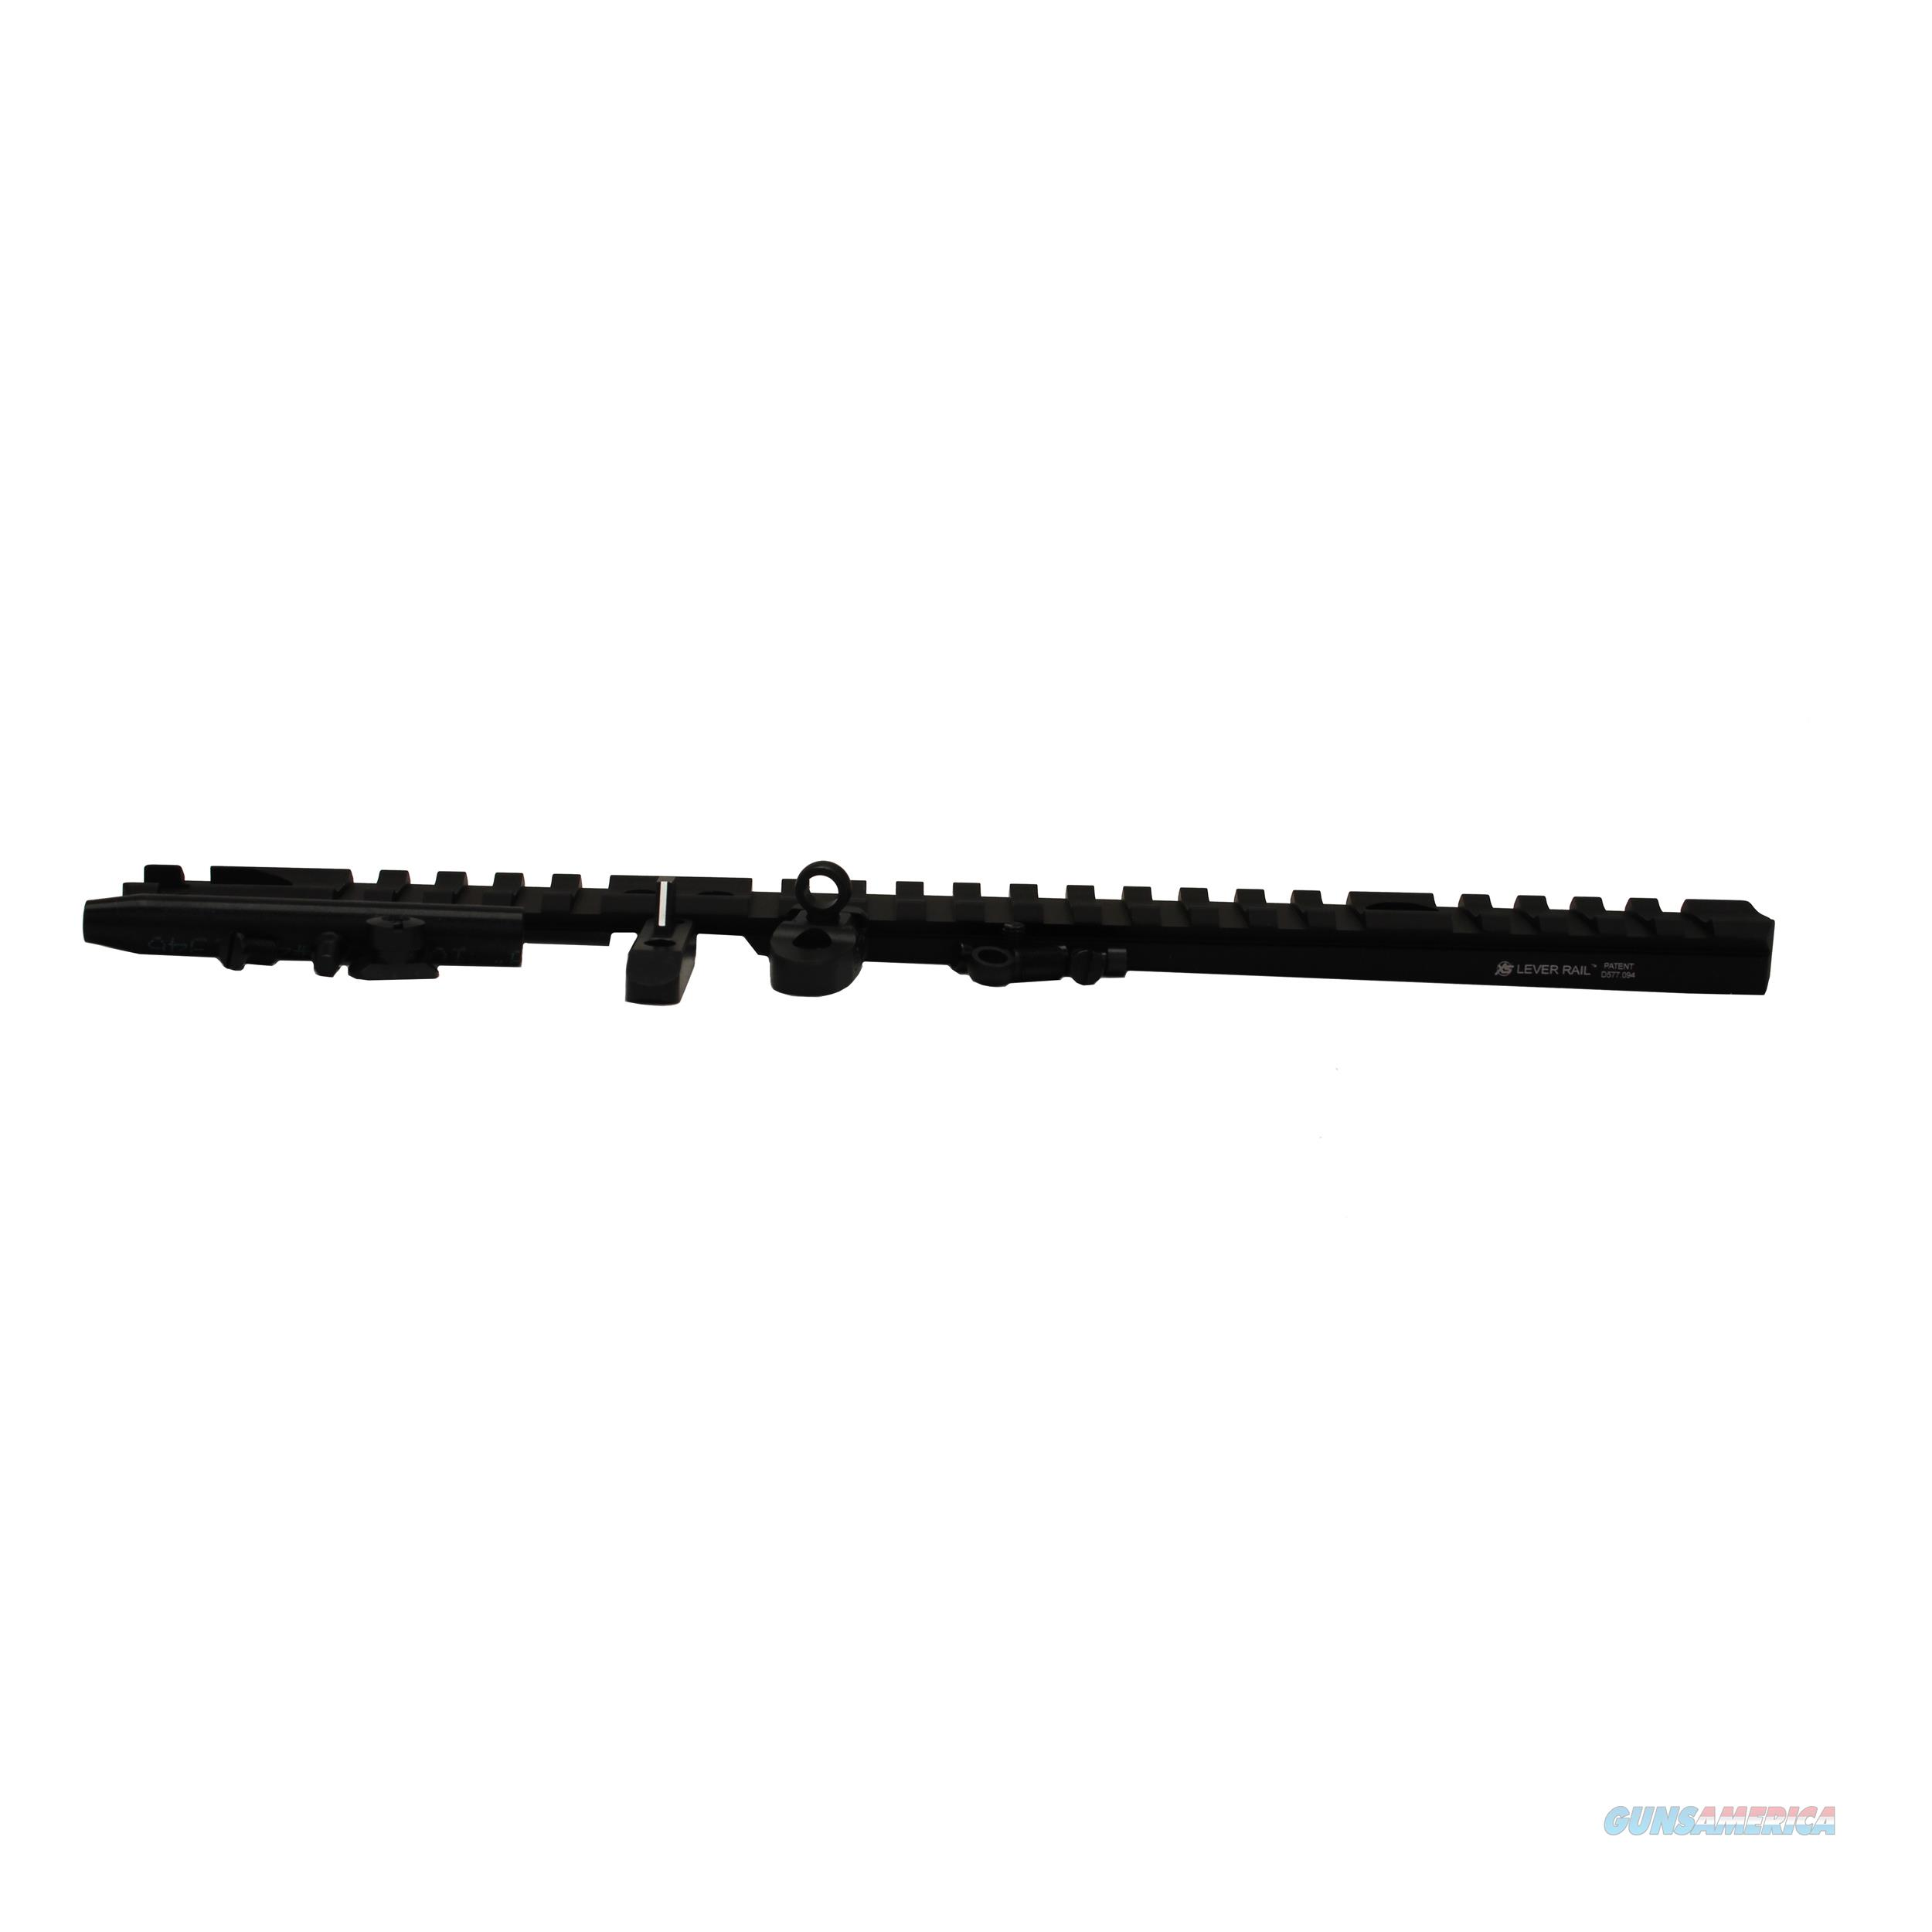 Xs Sights Leverrail Ghost Ring Ws ML-1002-5  Non-Guns > Iron/Metal/Peep Sights